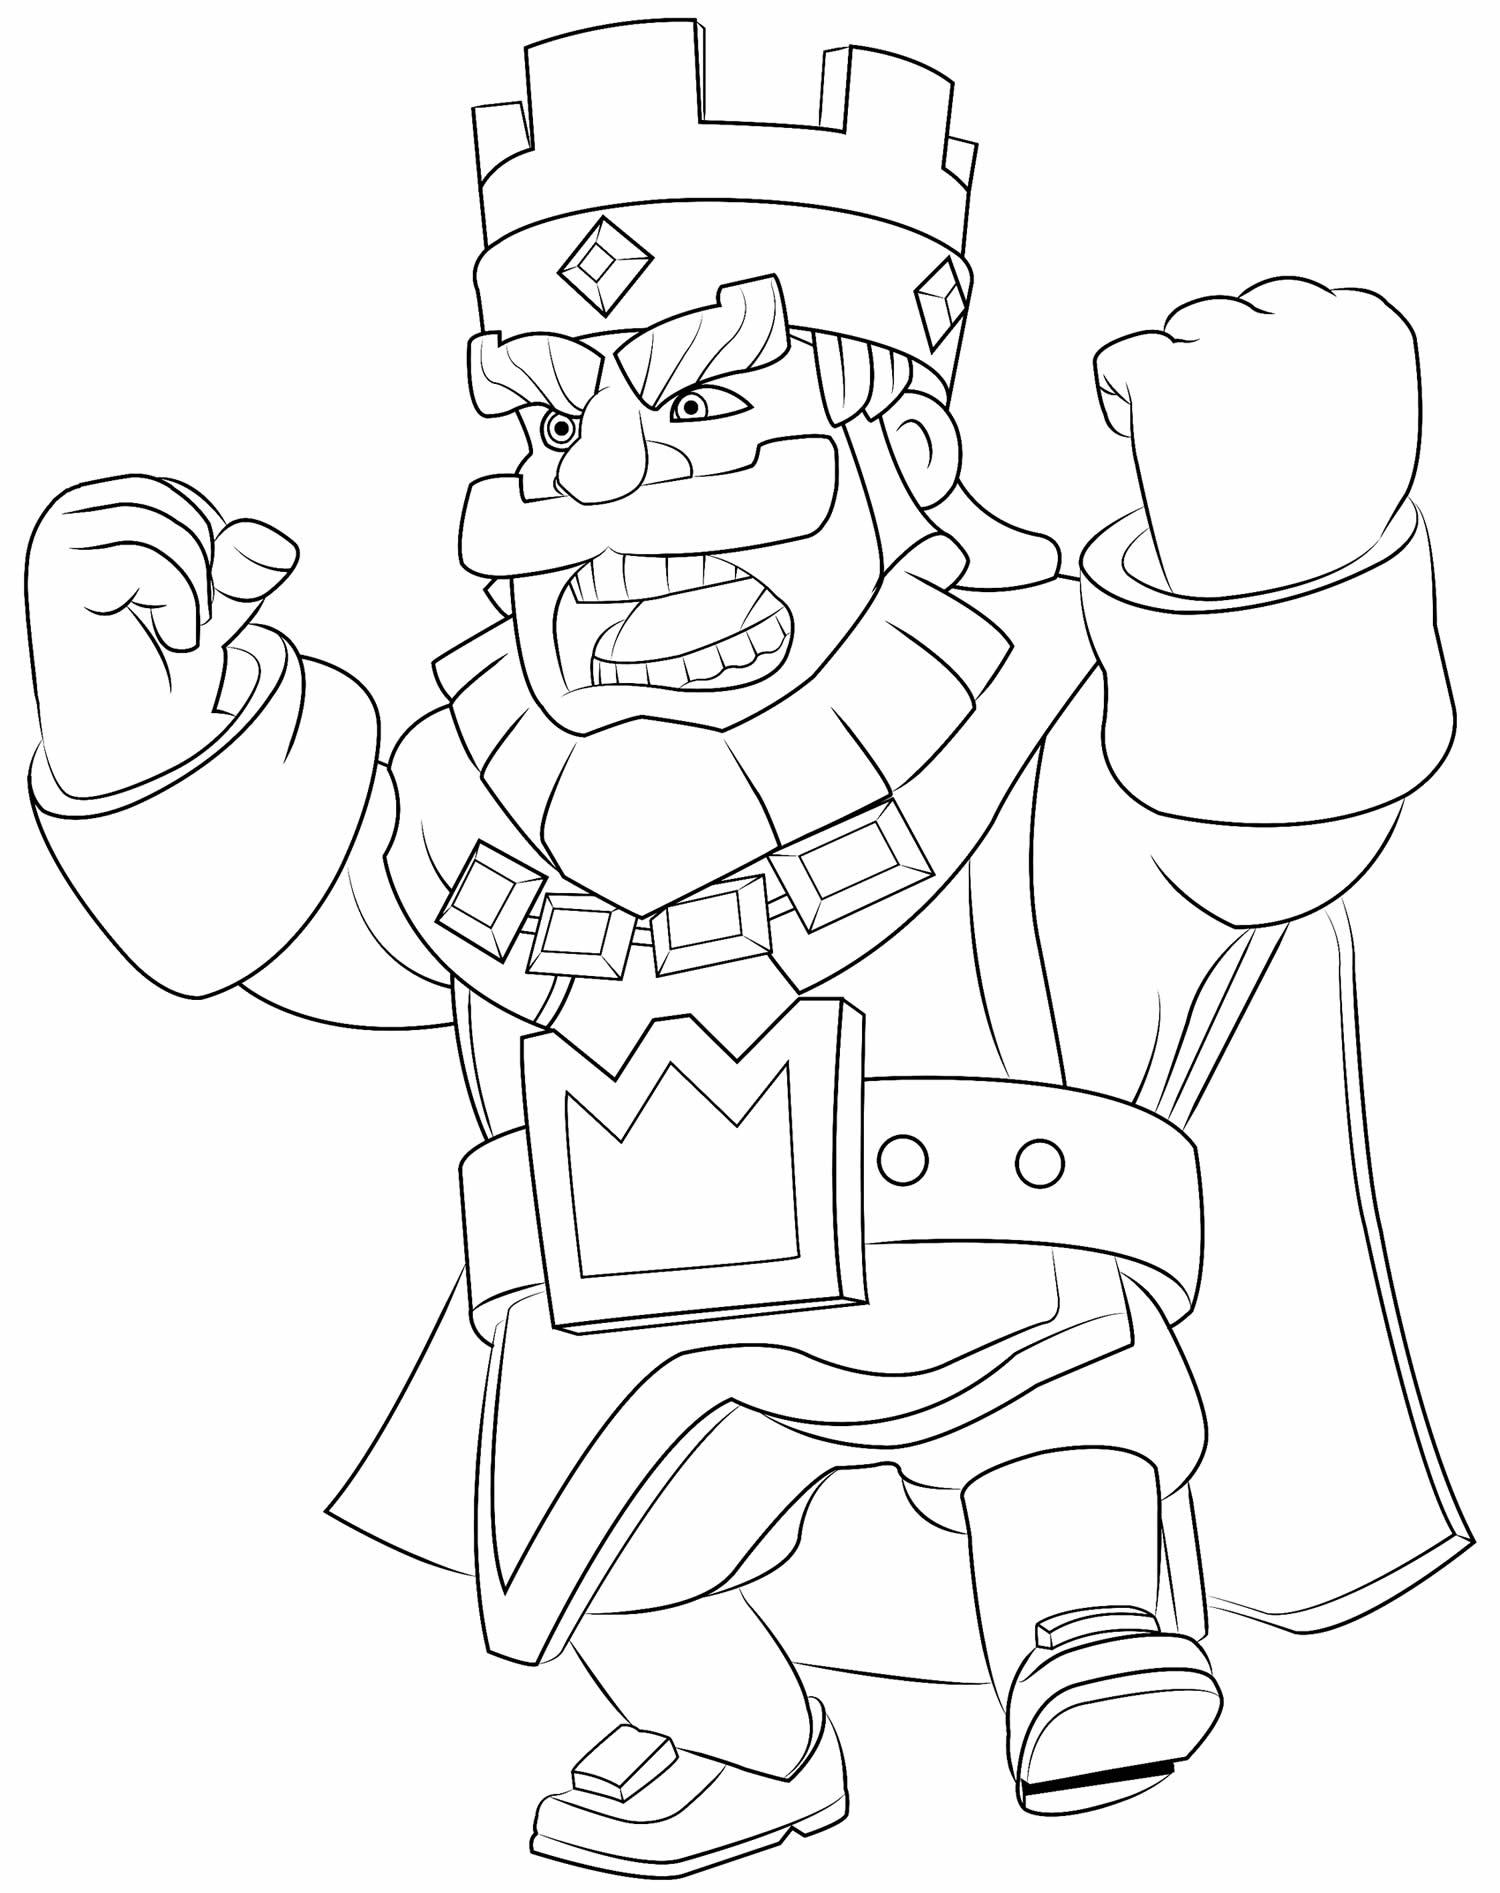 Desenho para colorir de Clash of Clans - Rei